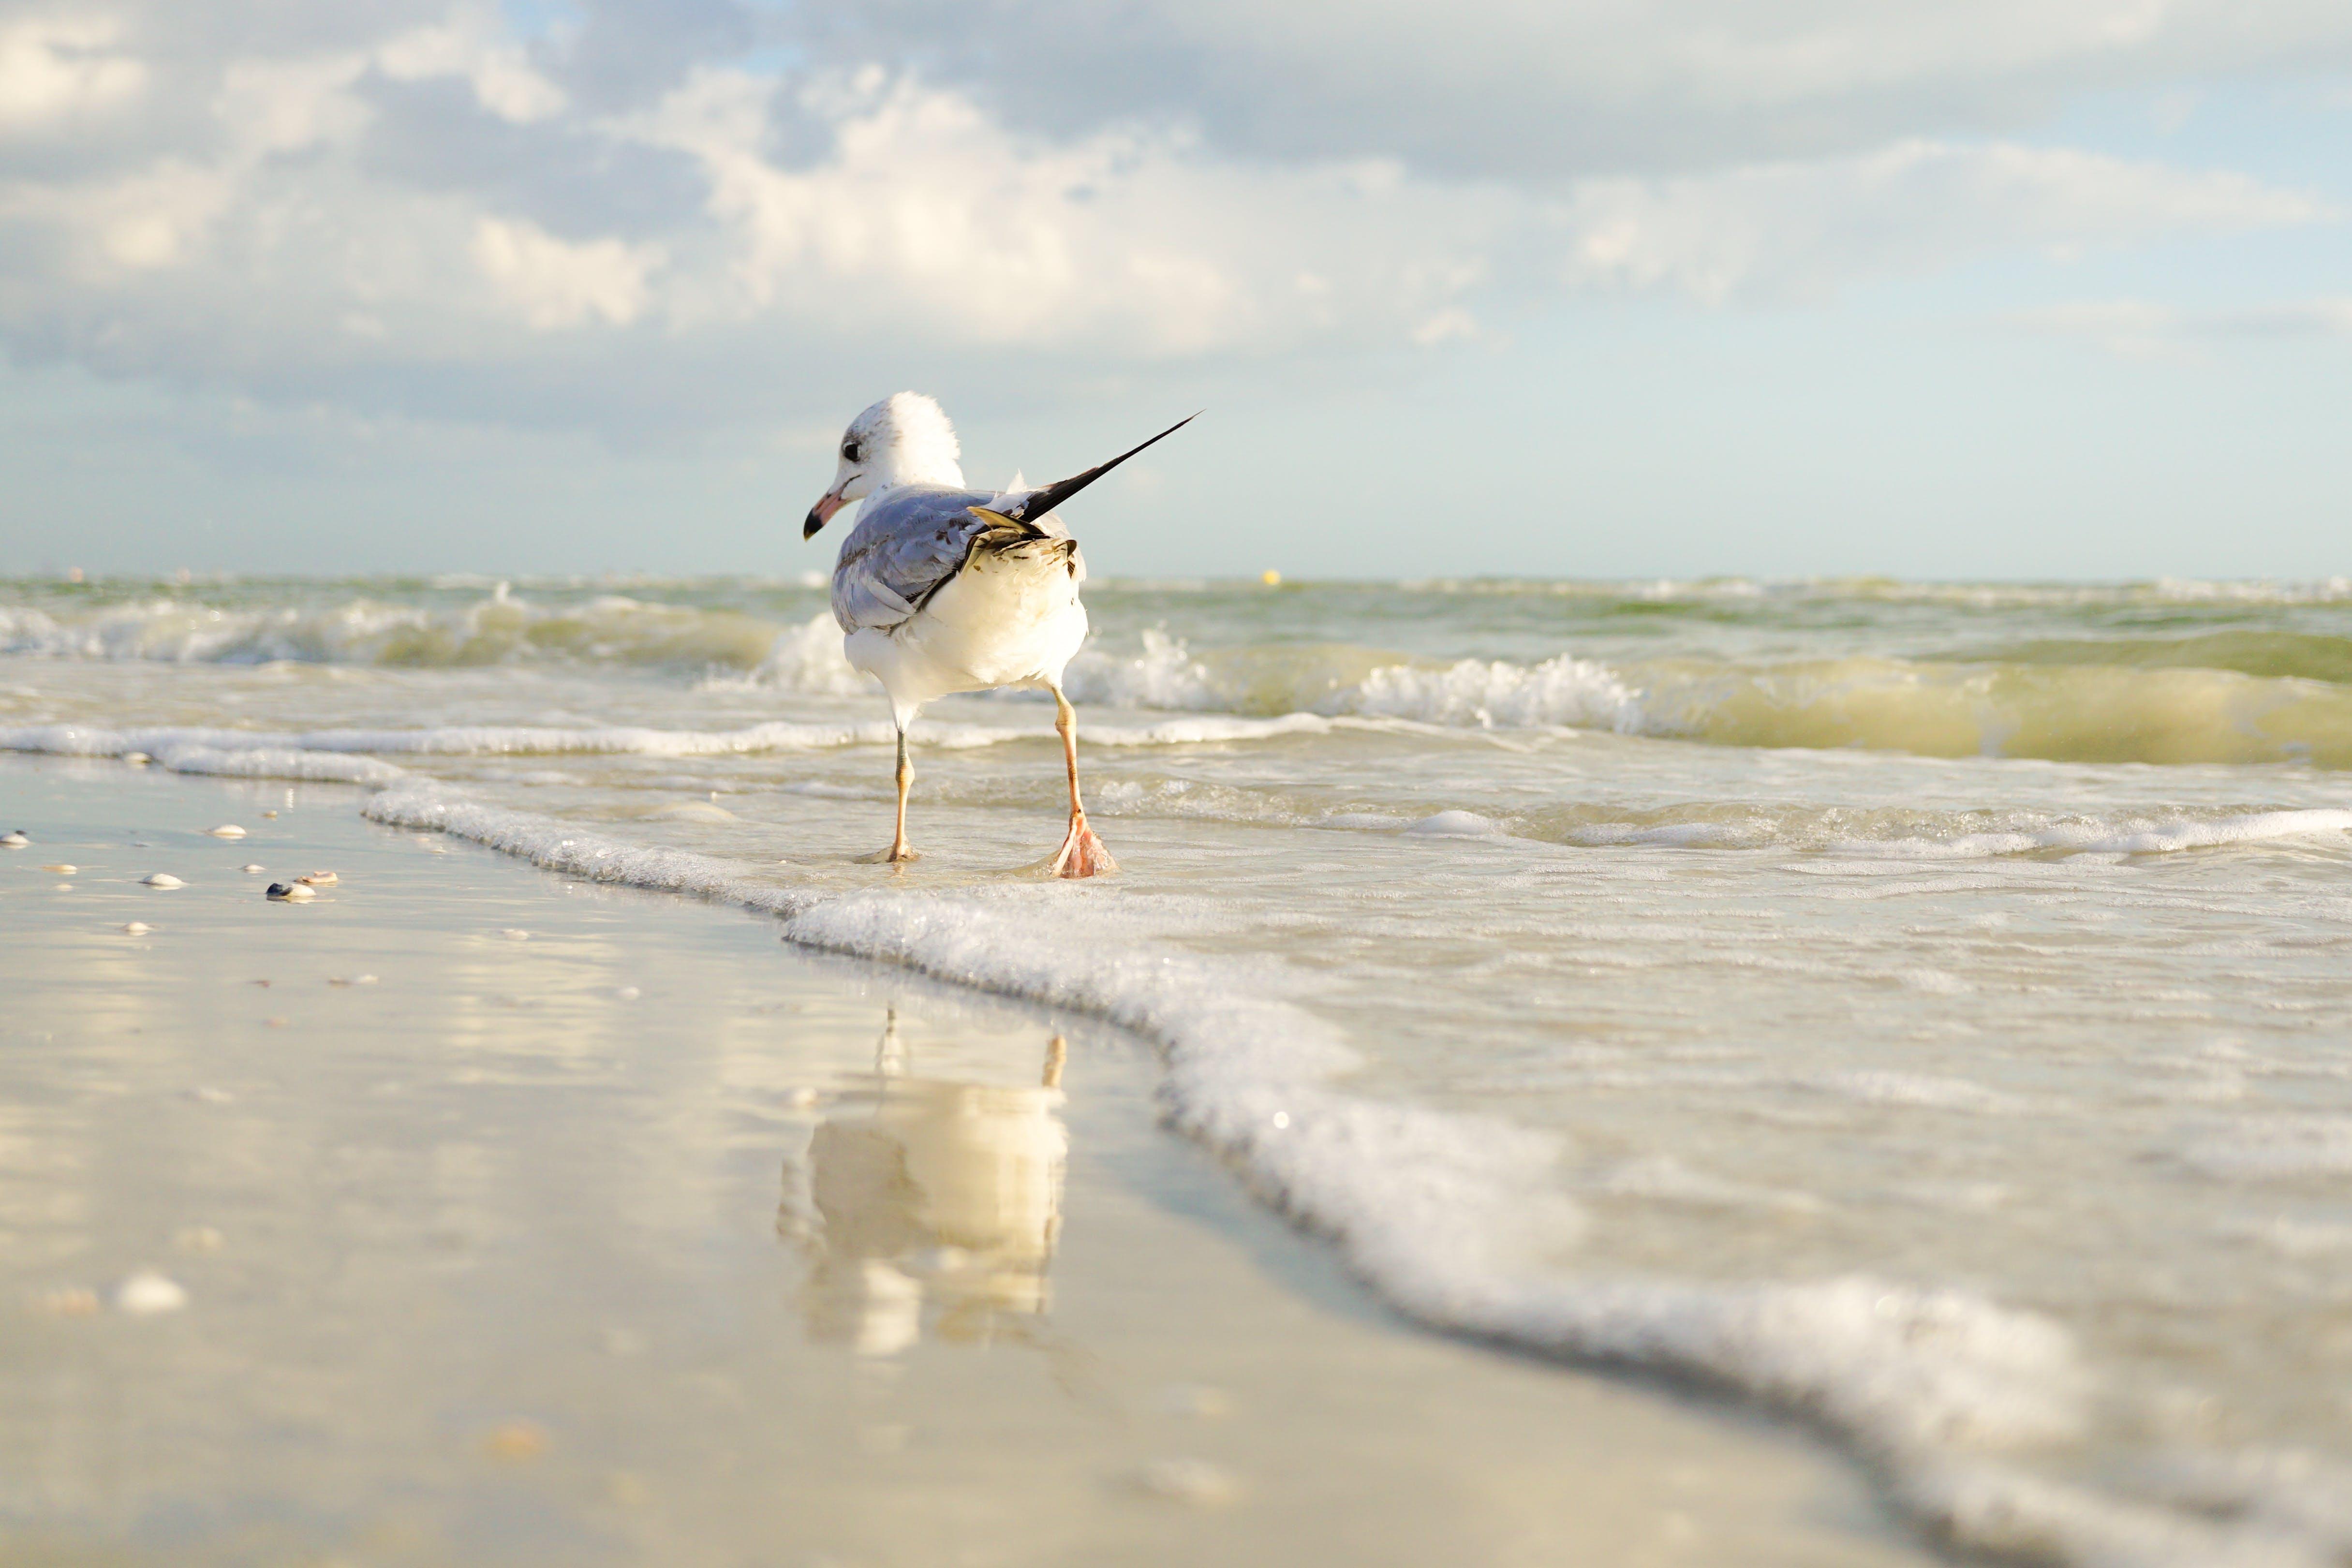 White and Gray Bird Standing on Seaside